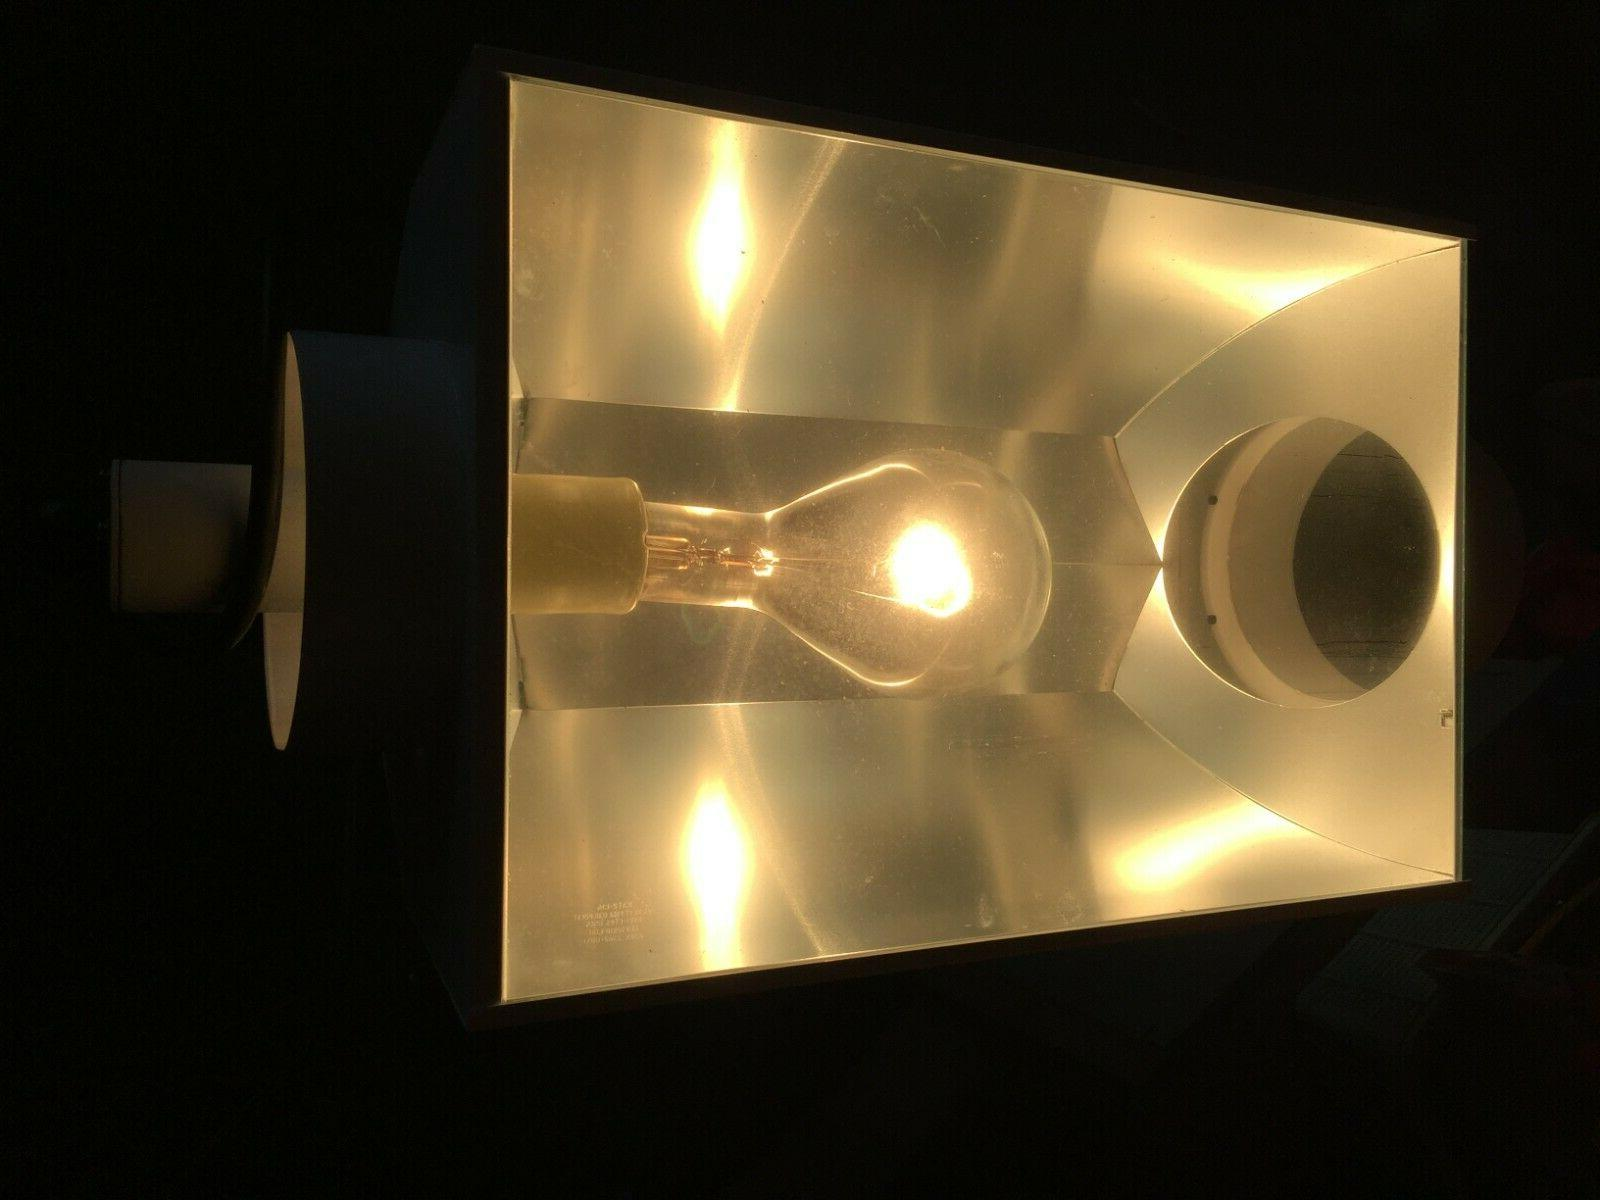 Hydrofarm Air Cooled Grow Hood Reflector 1000W Lite